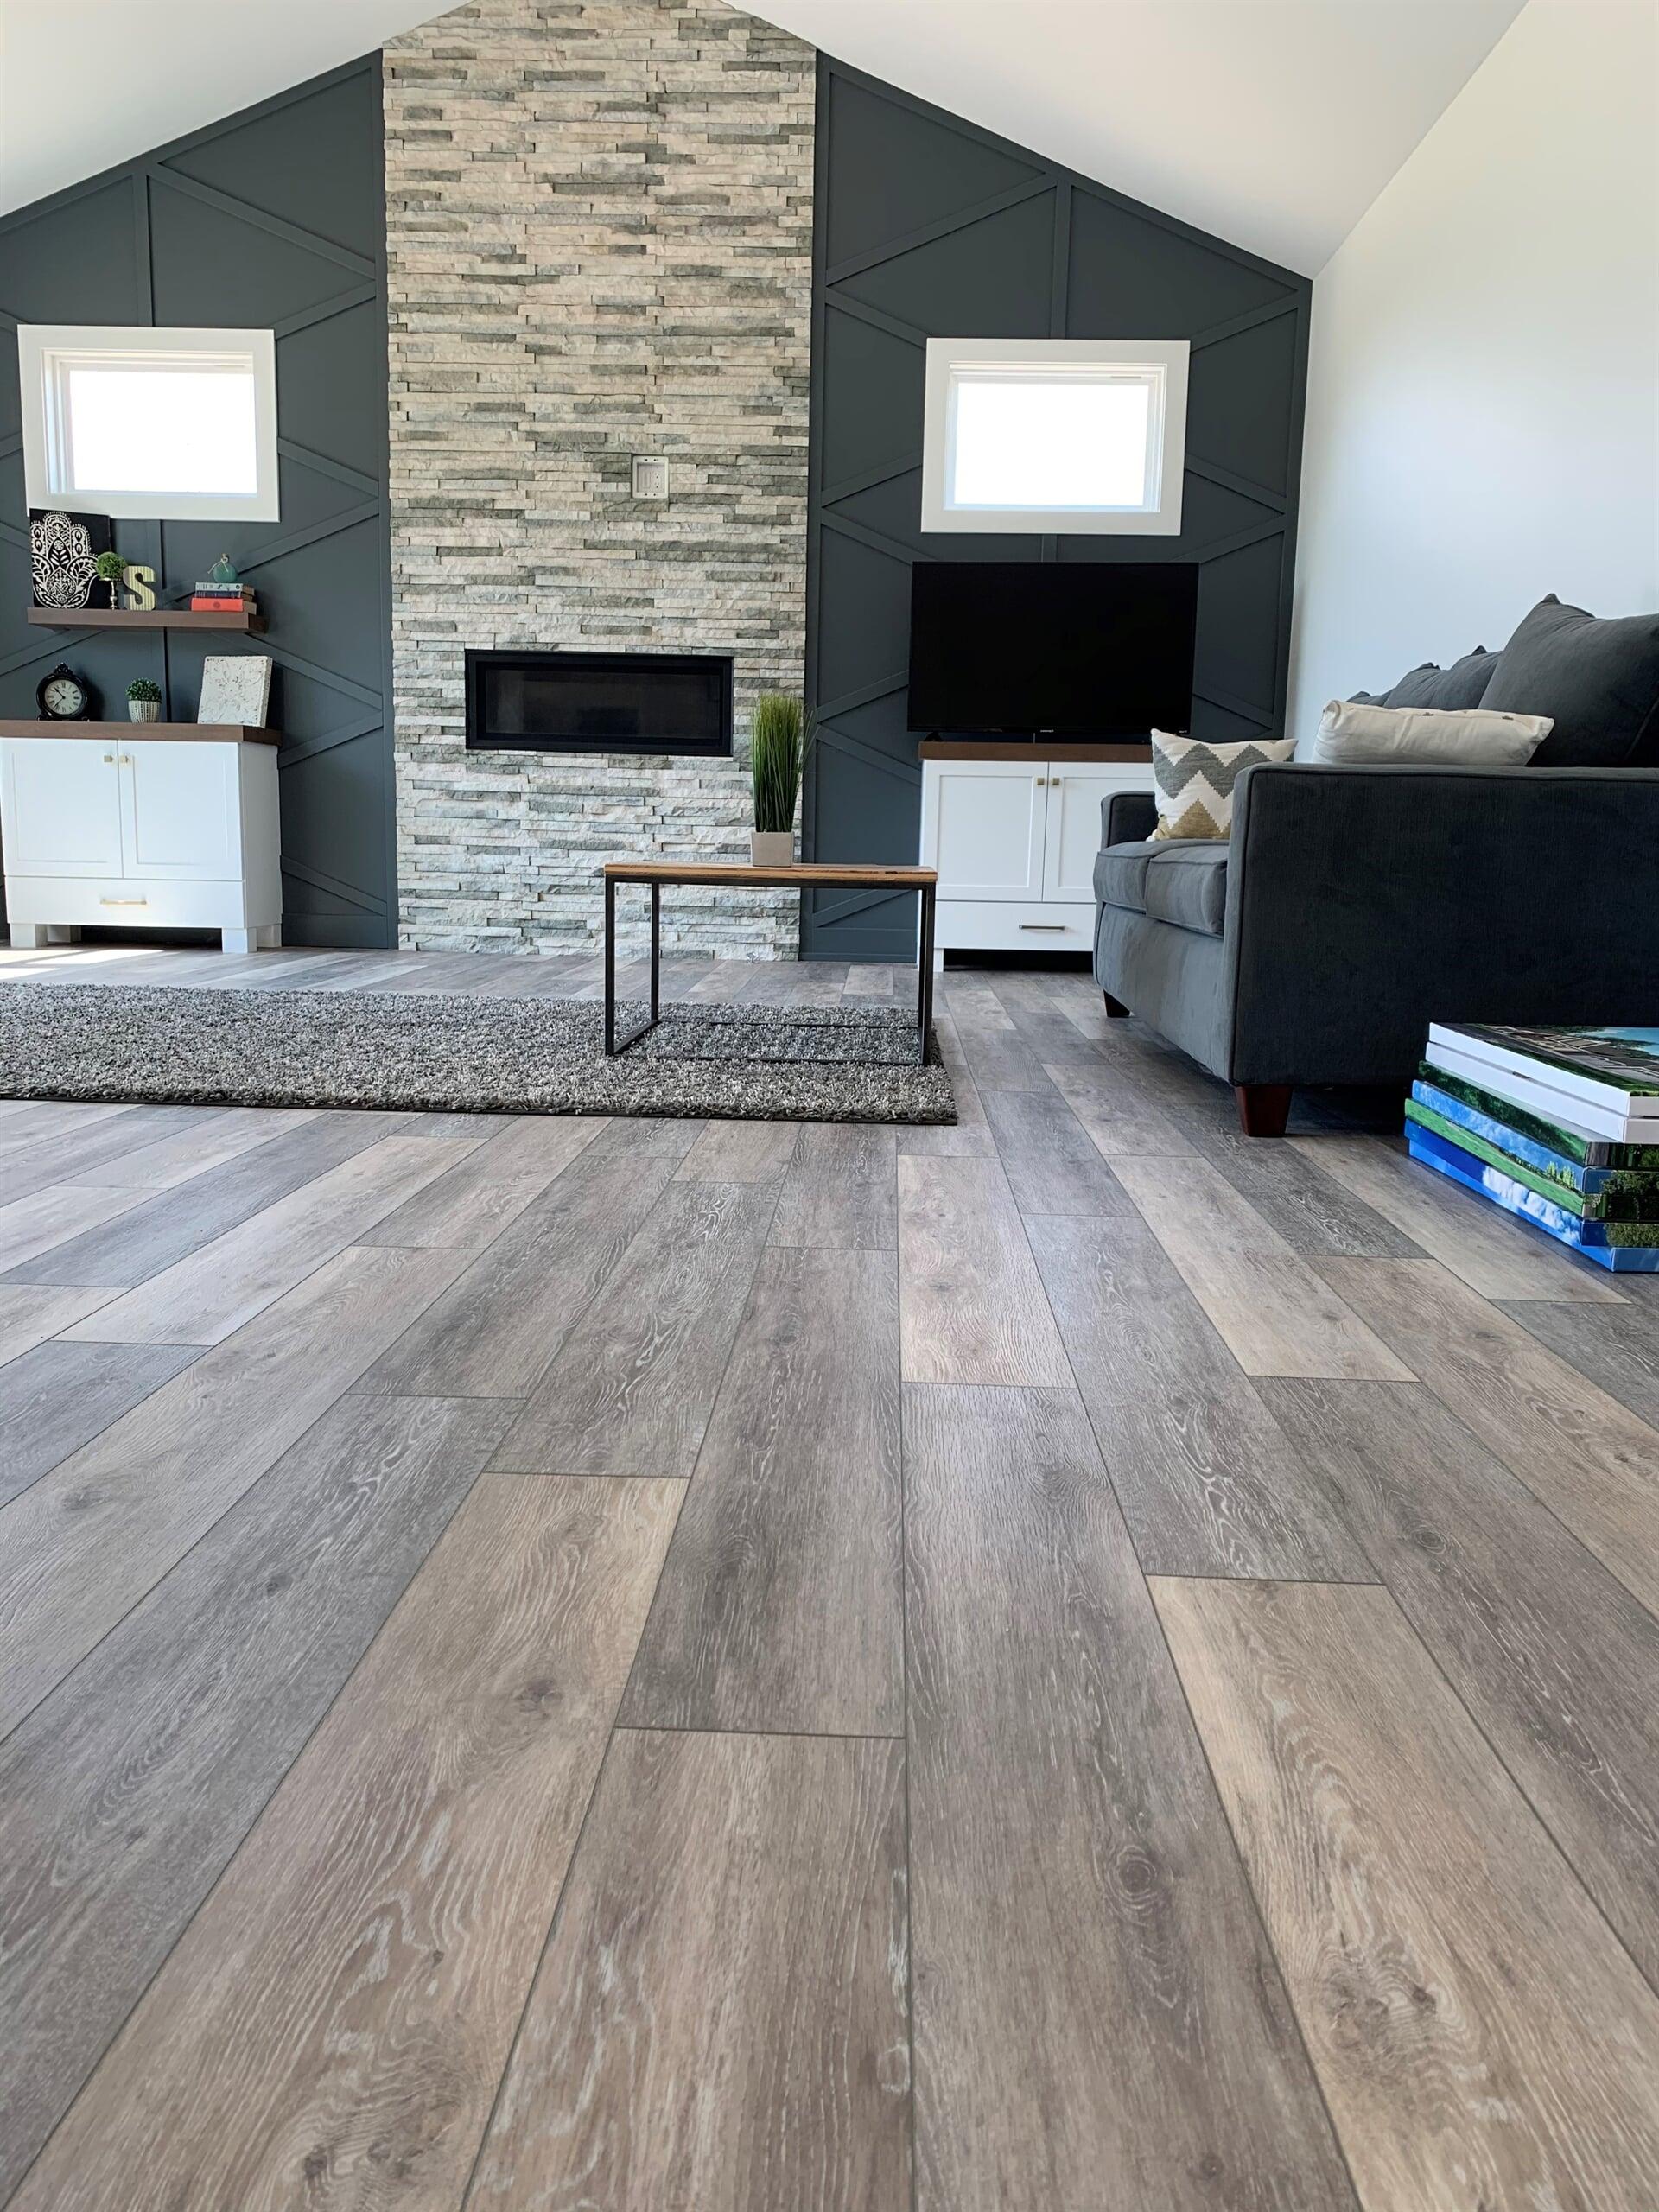 Vinyl flooring in Caledonia, MI from Village Custom Interiors